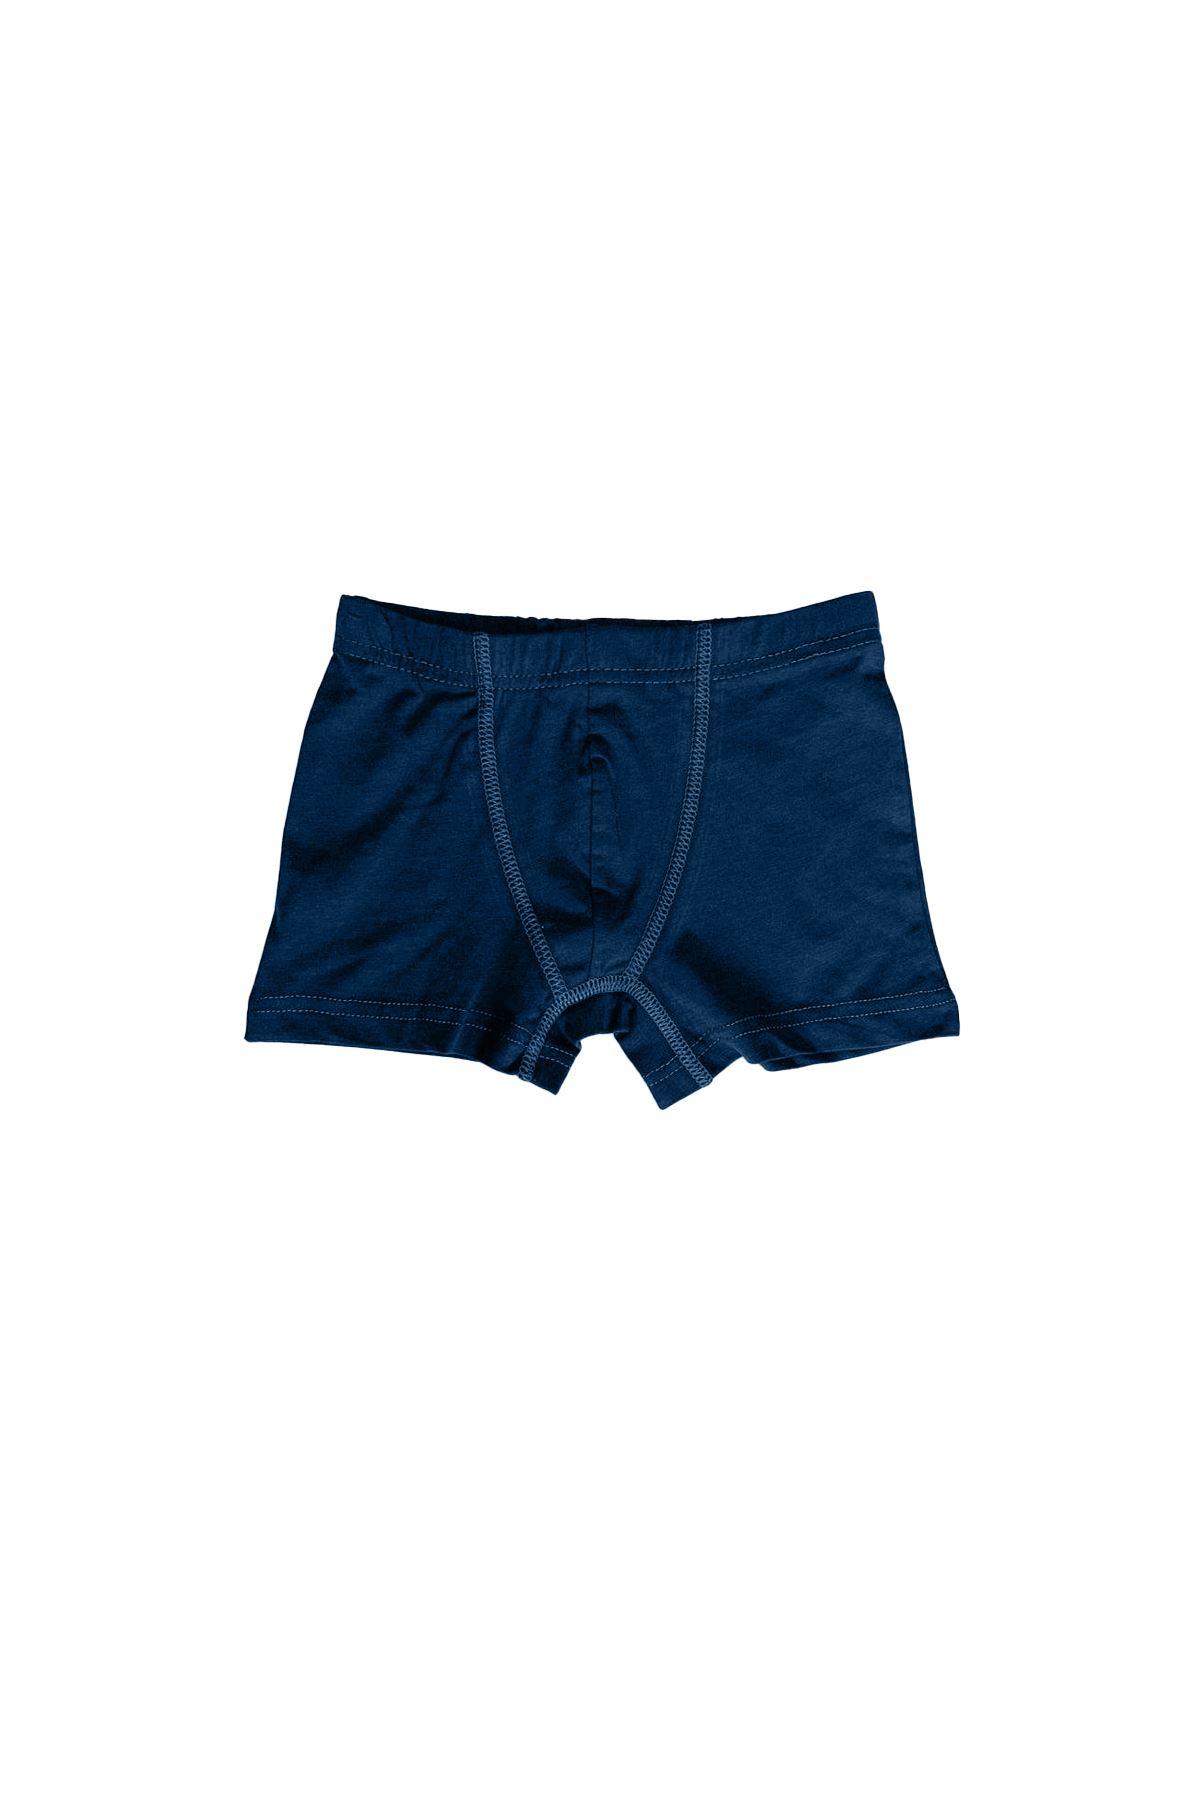 Füme Erkek Çocuk Pamuklu Boxer 209